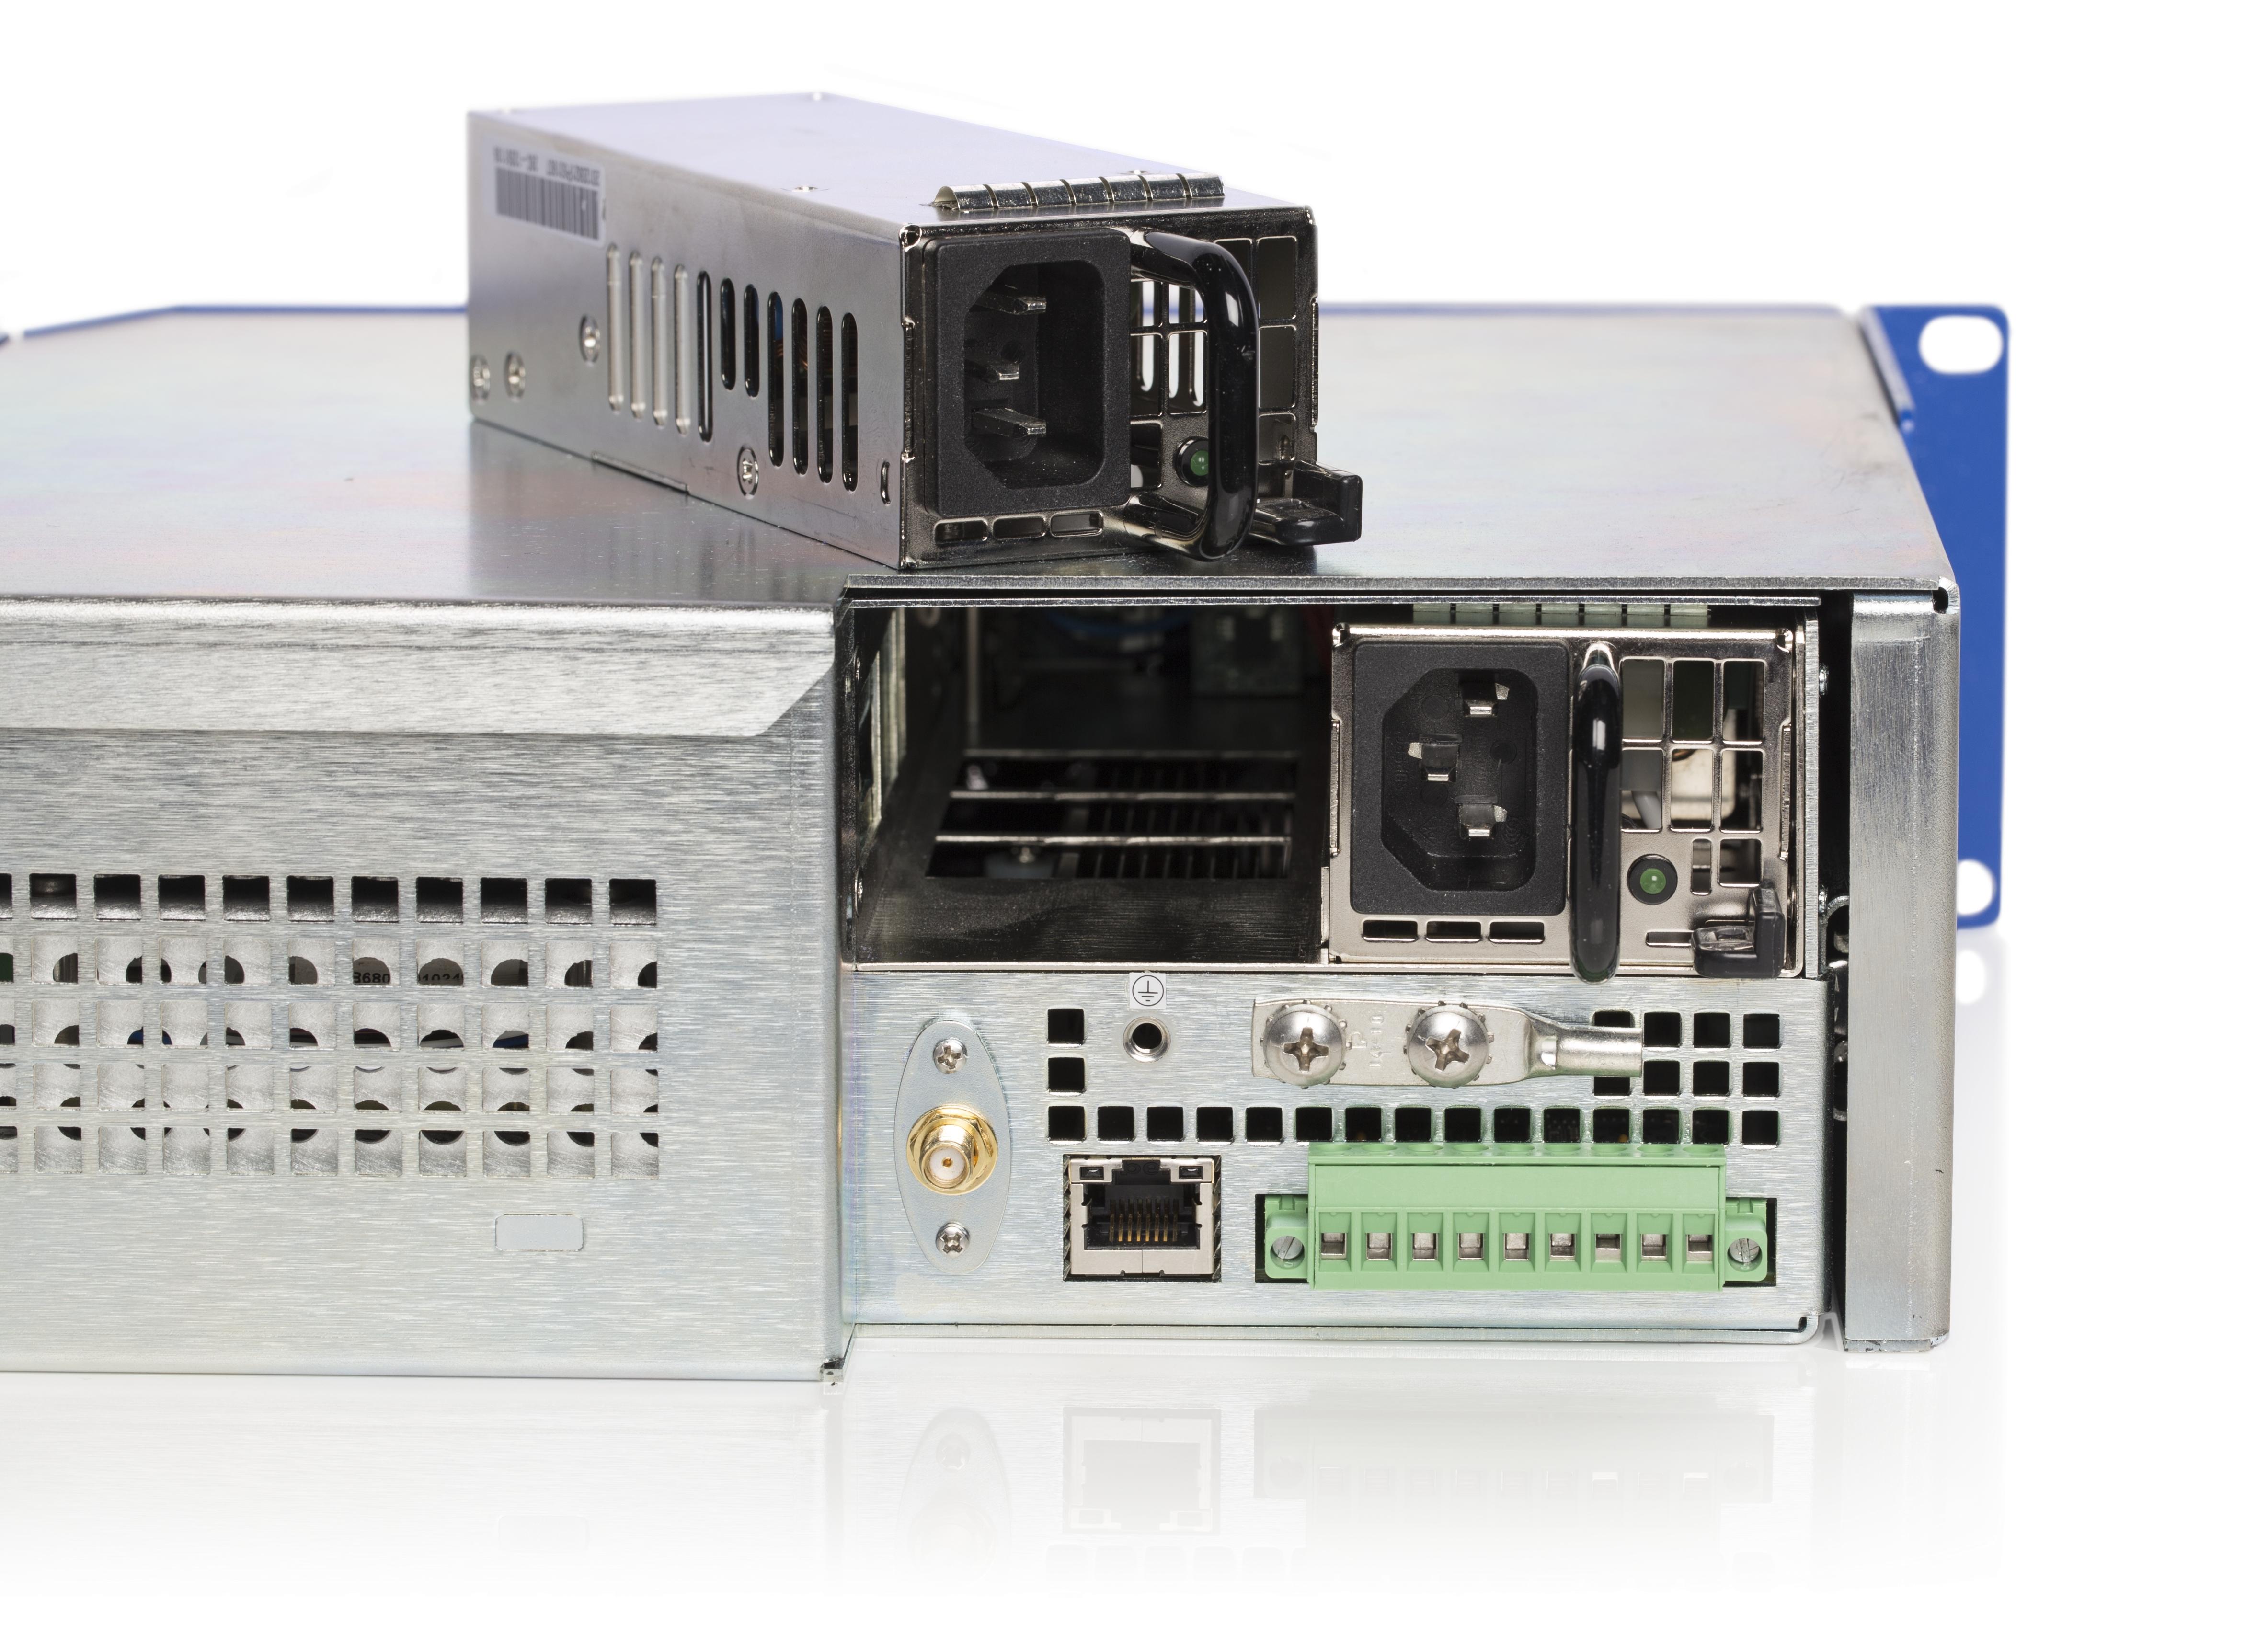 FG-750 : Система мониторинга ВОЛС - FG-750 FIBER GUARDIAN